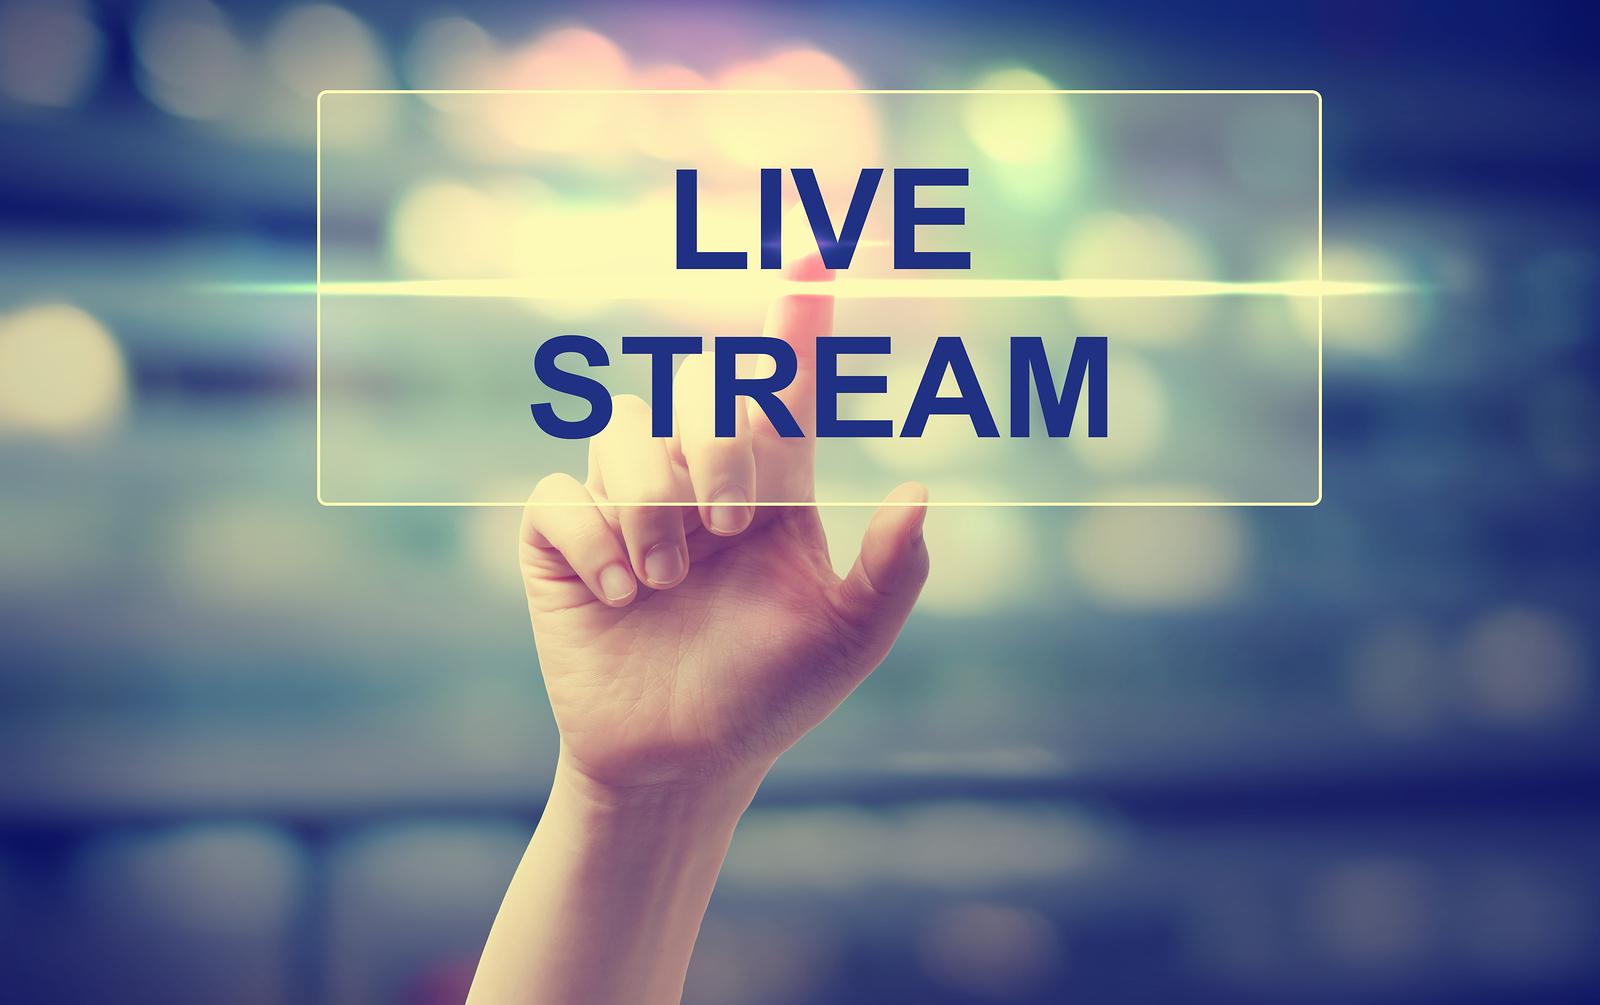 bigstock-Hand-Pressing-Live-Stream-105062459.jpg